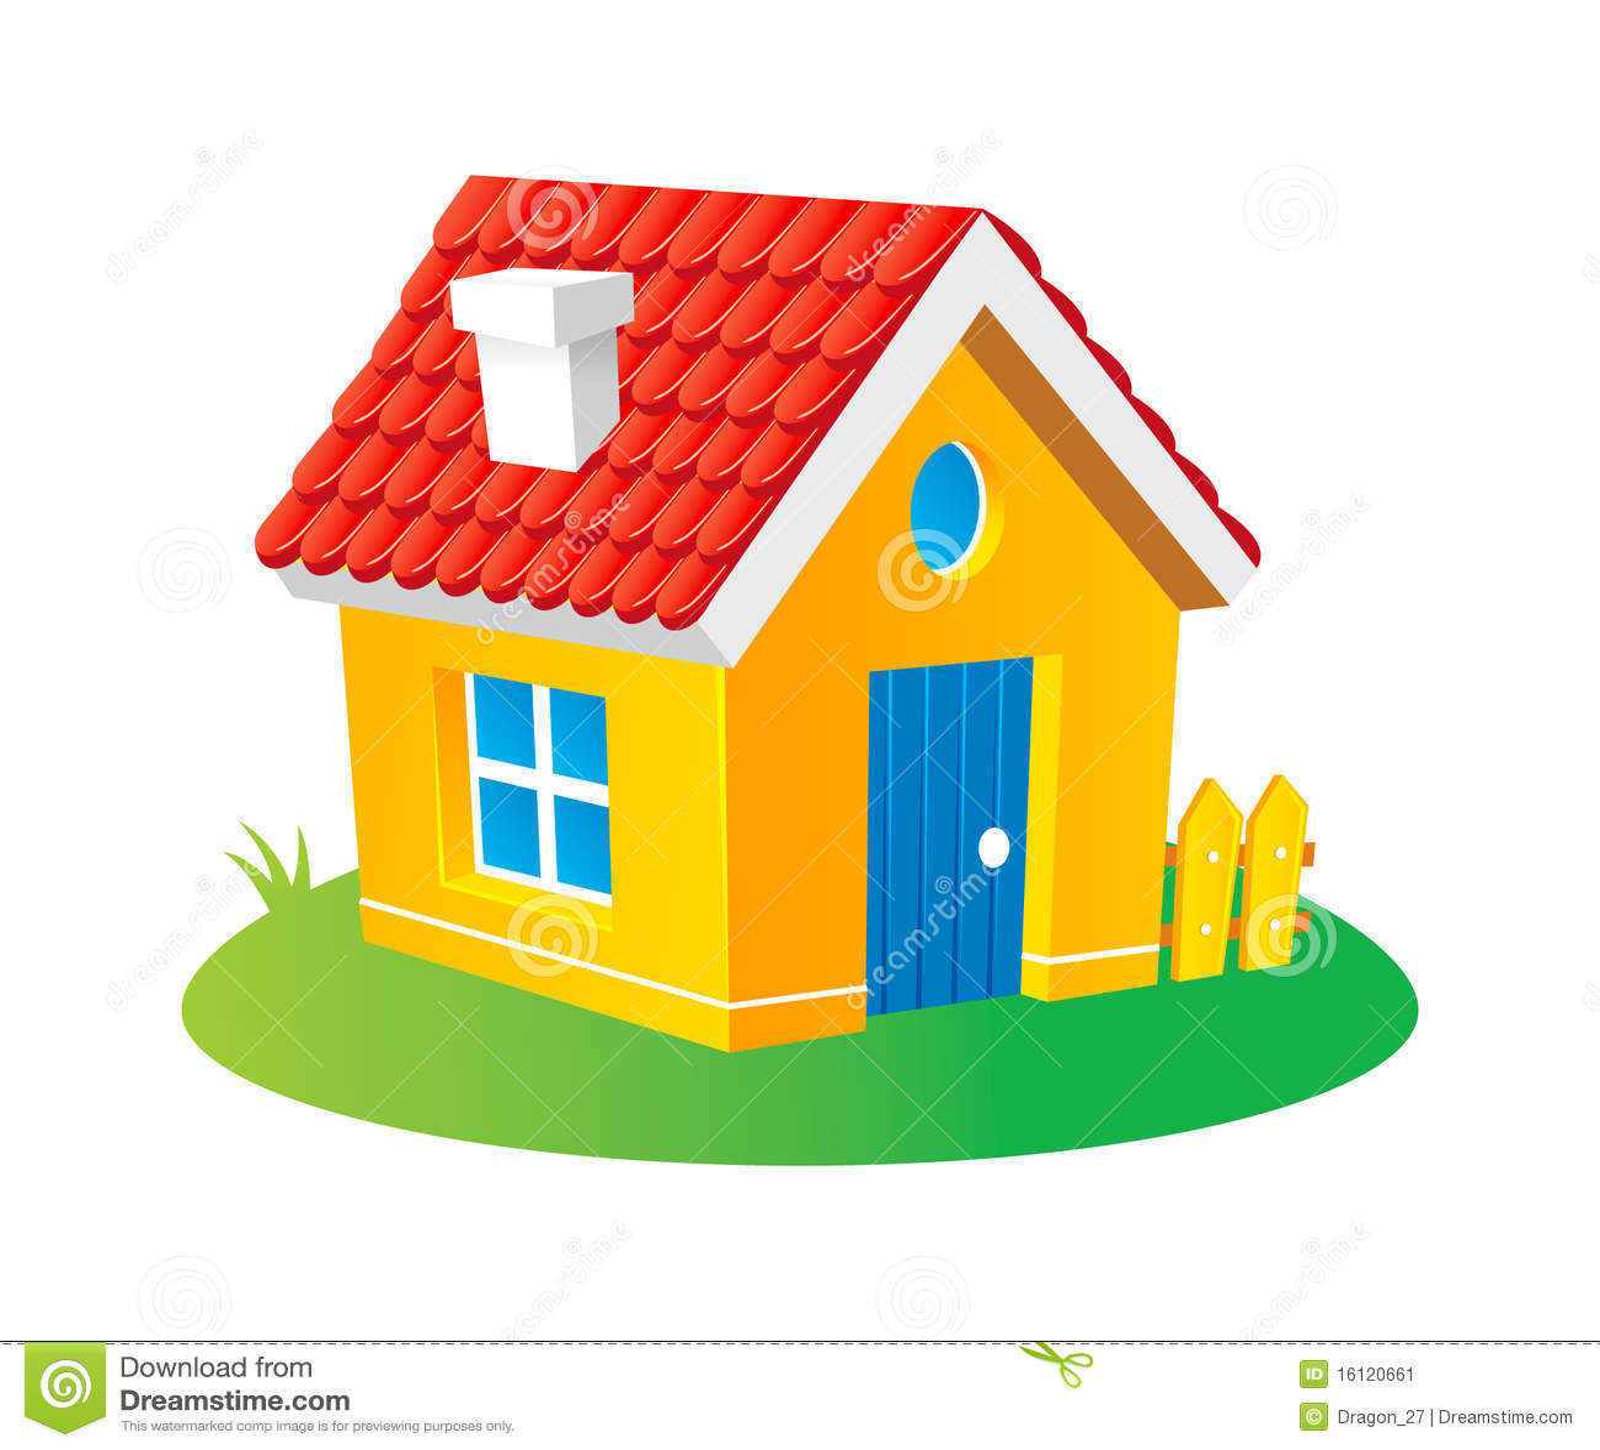 maison de dessin anim image stock image 16120661. Black Bedroom Furniture Sets. Home Design Ideas